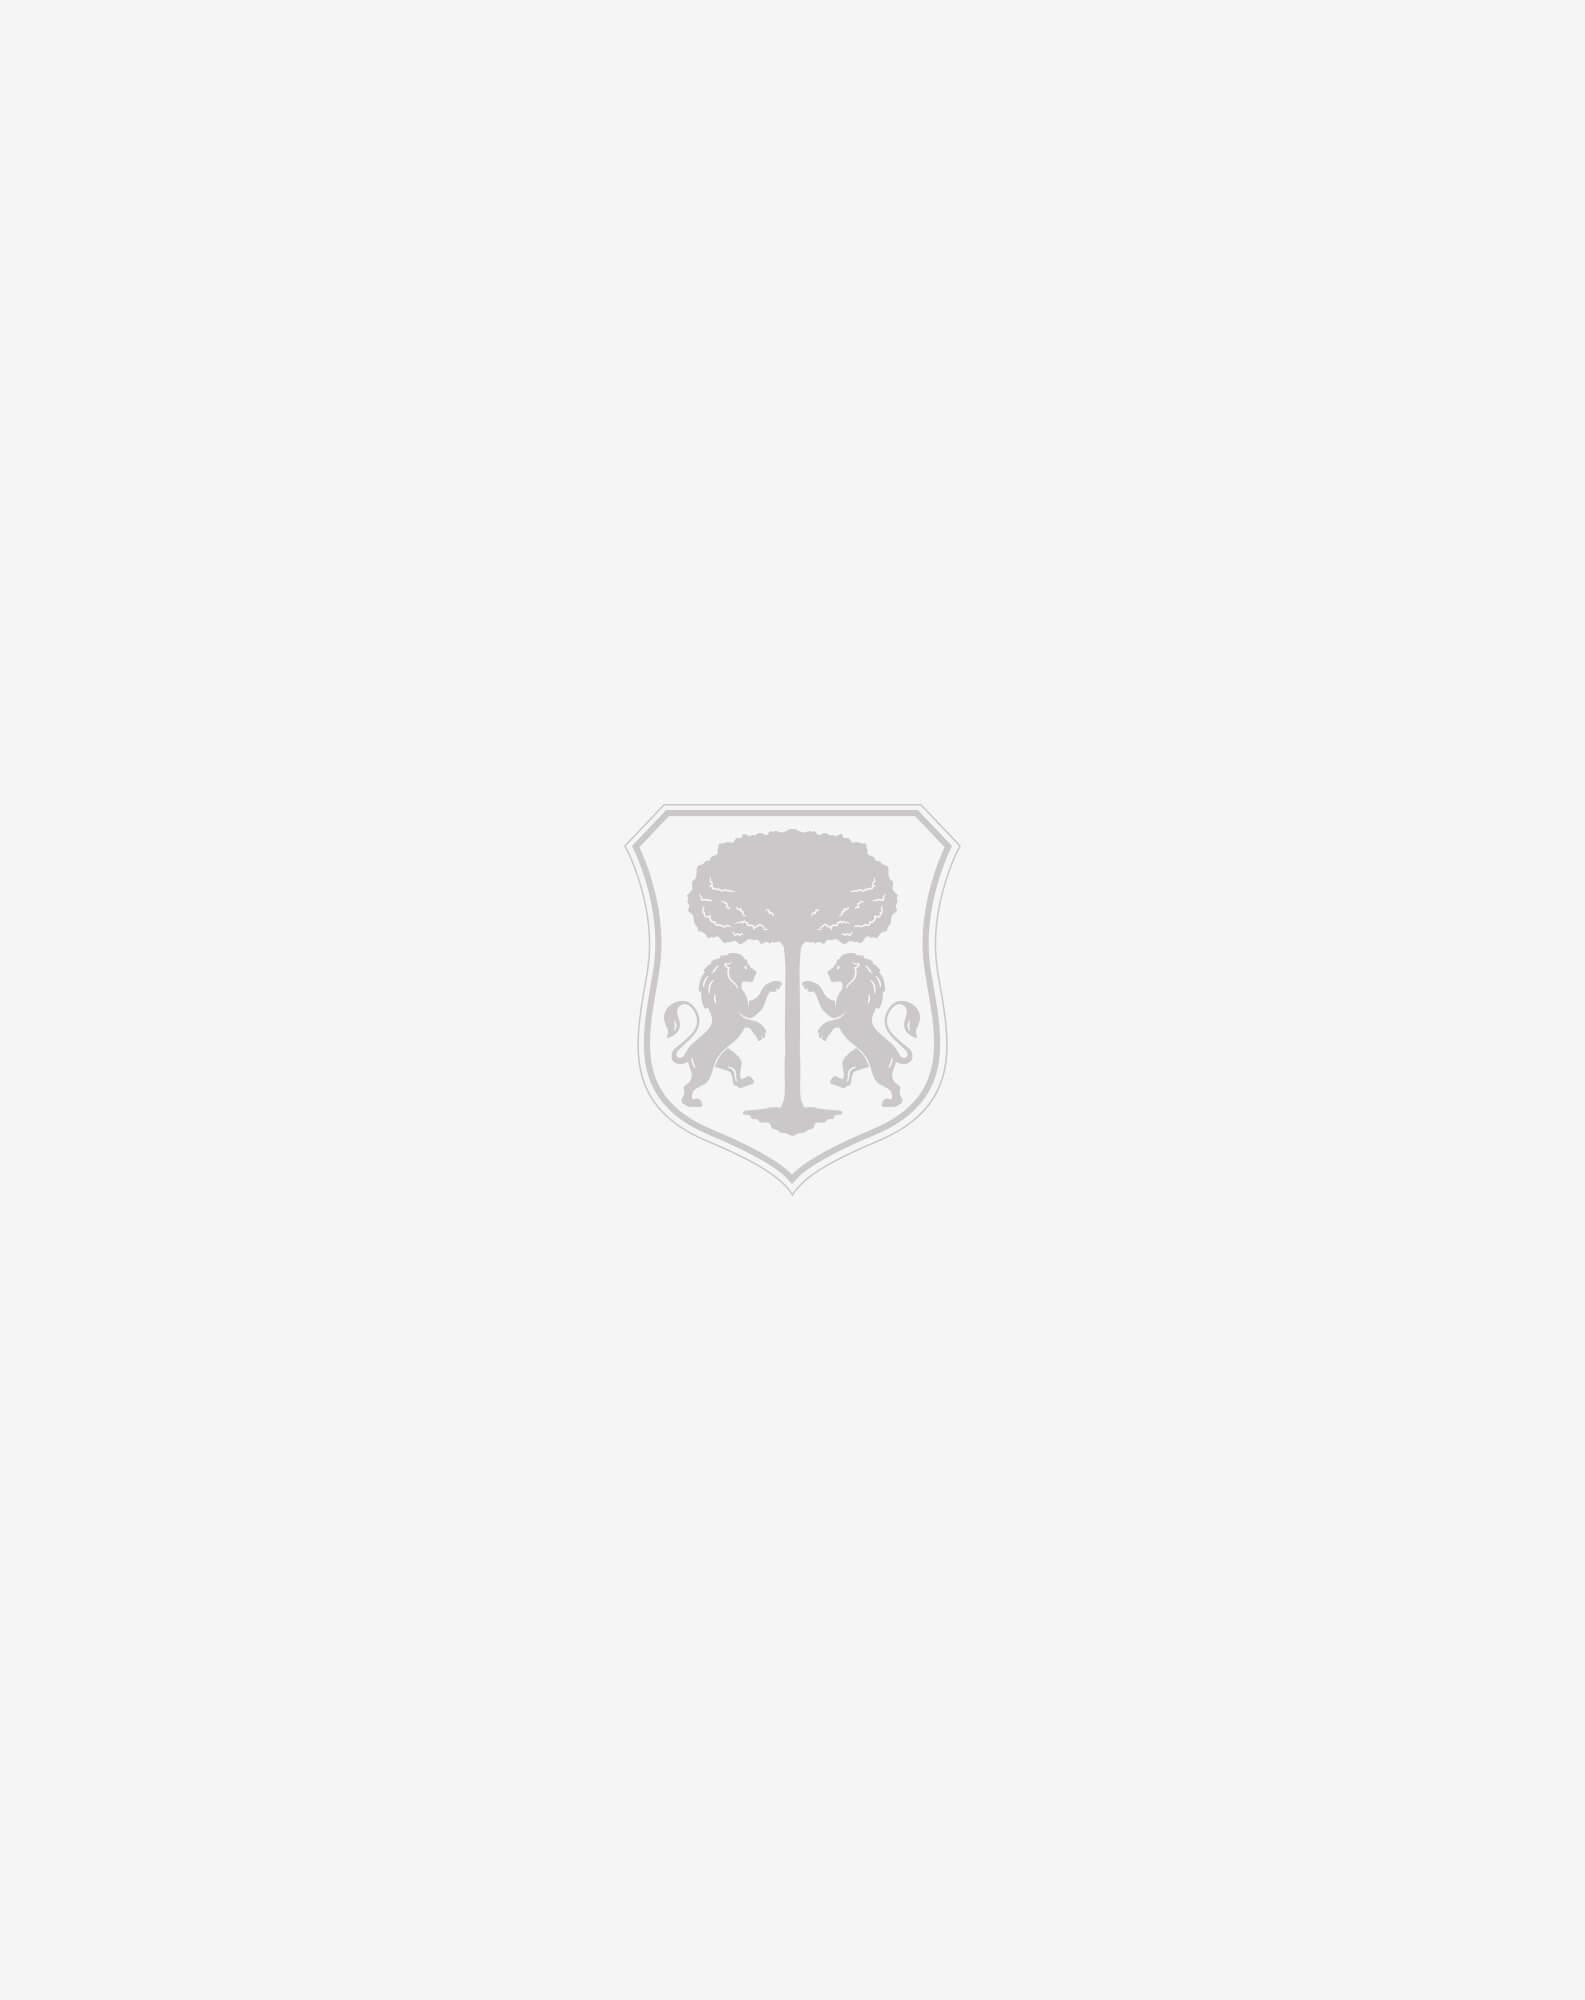 Violet jacquard tie with micro design